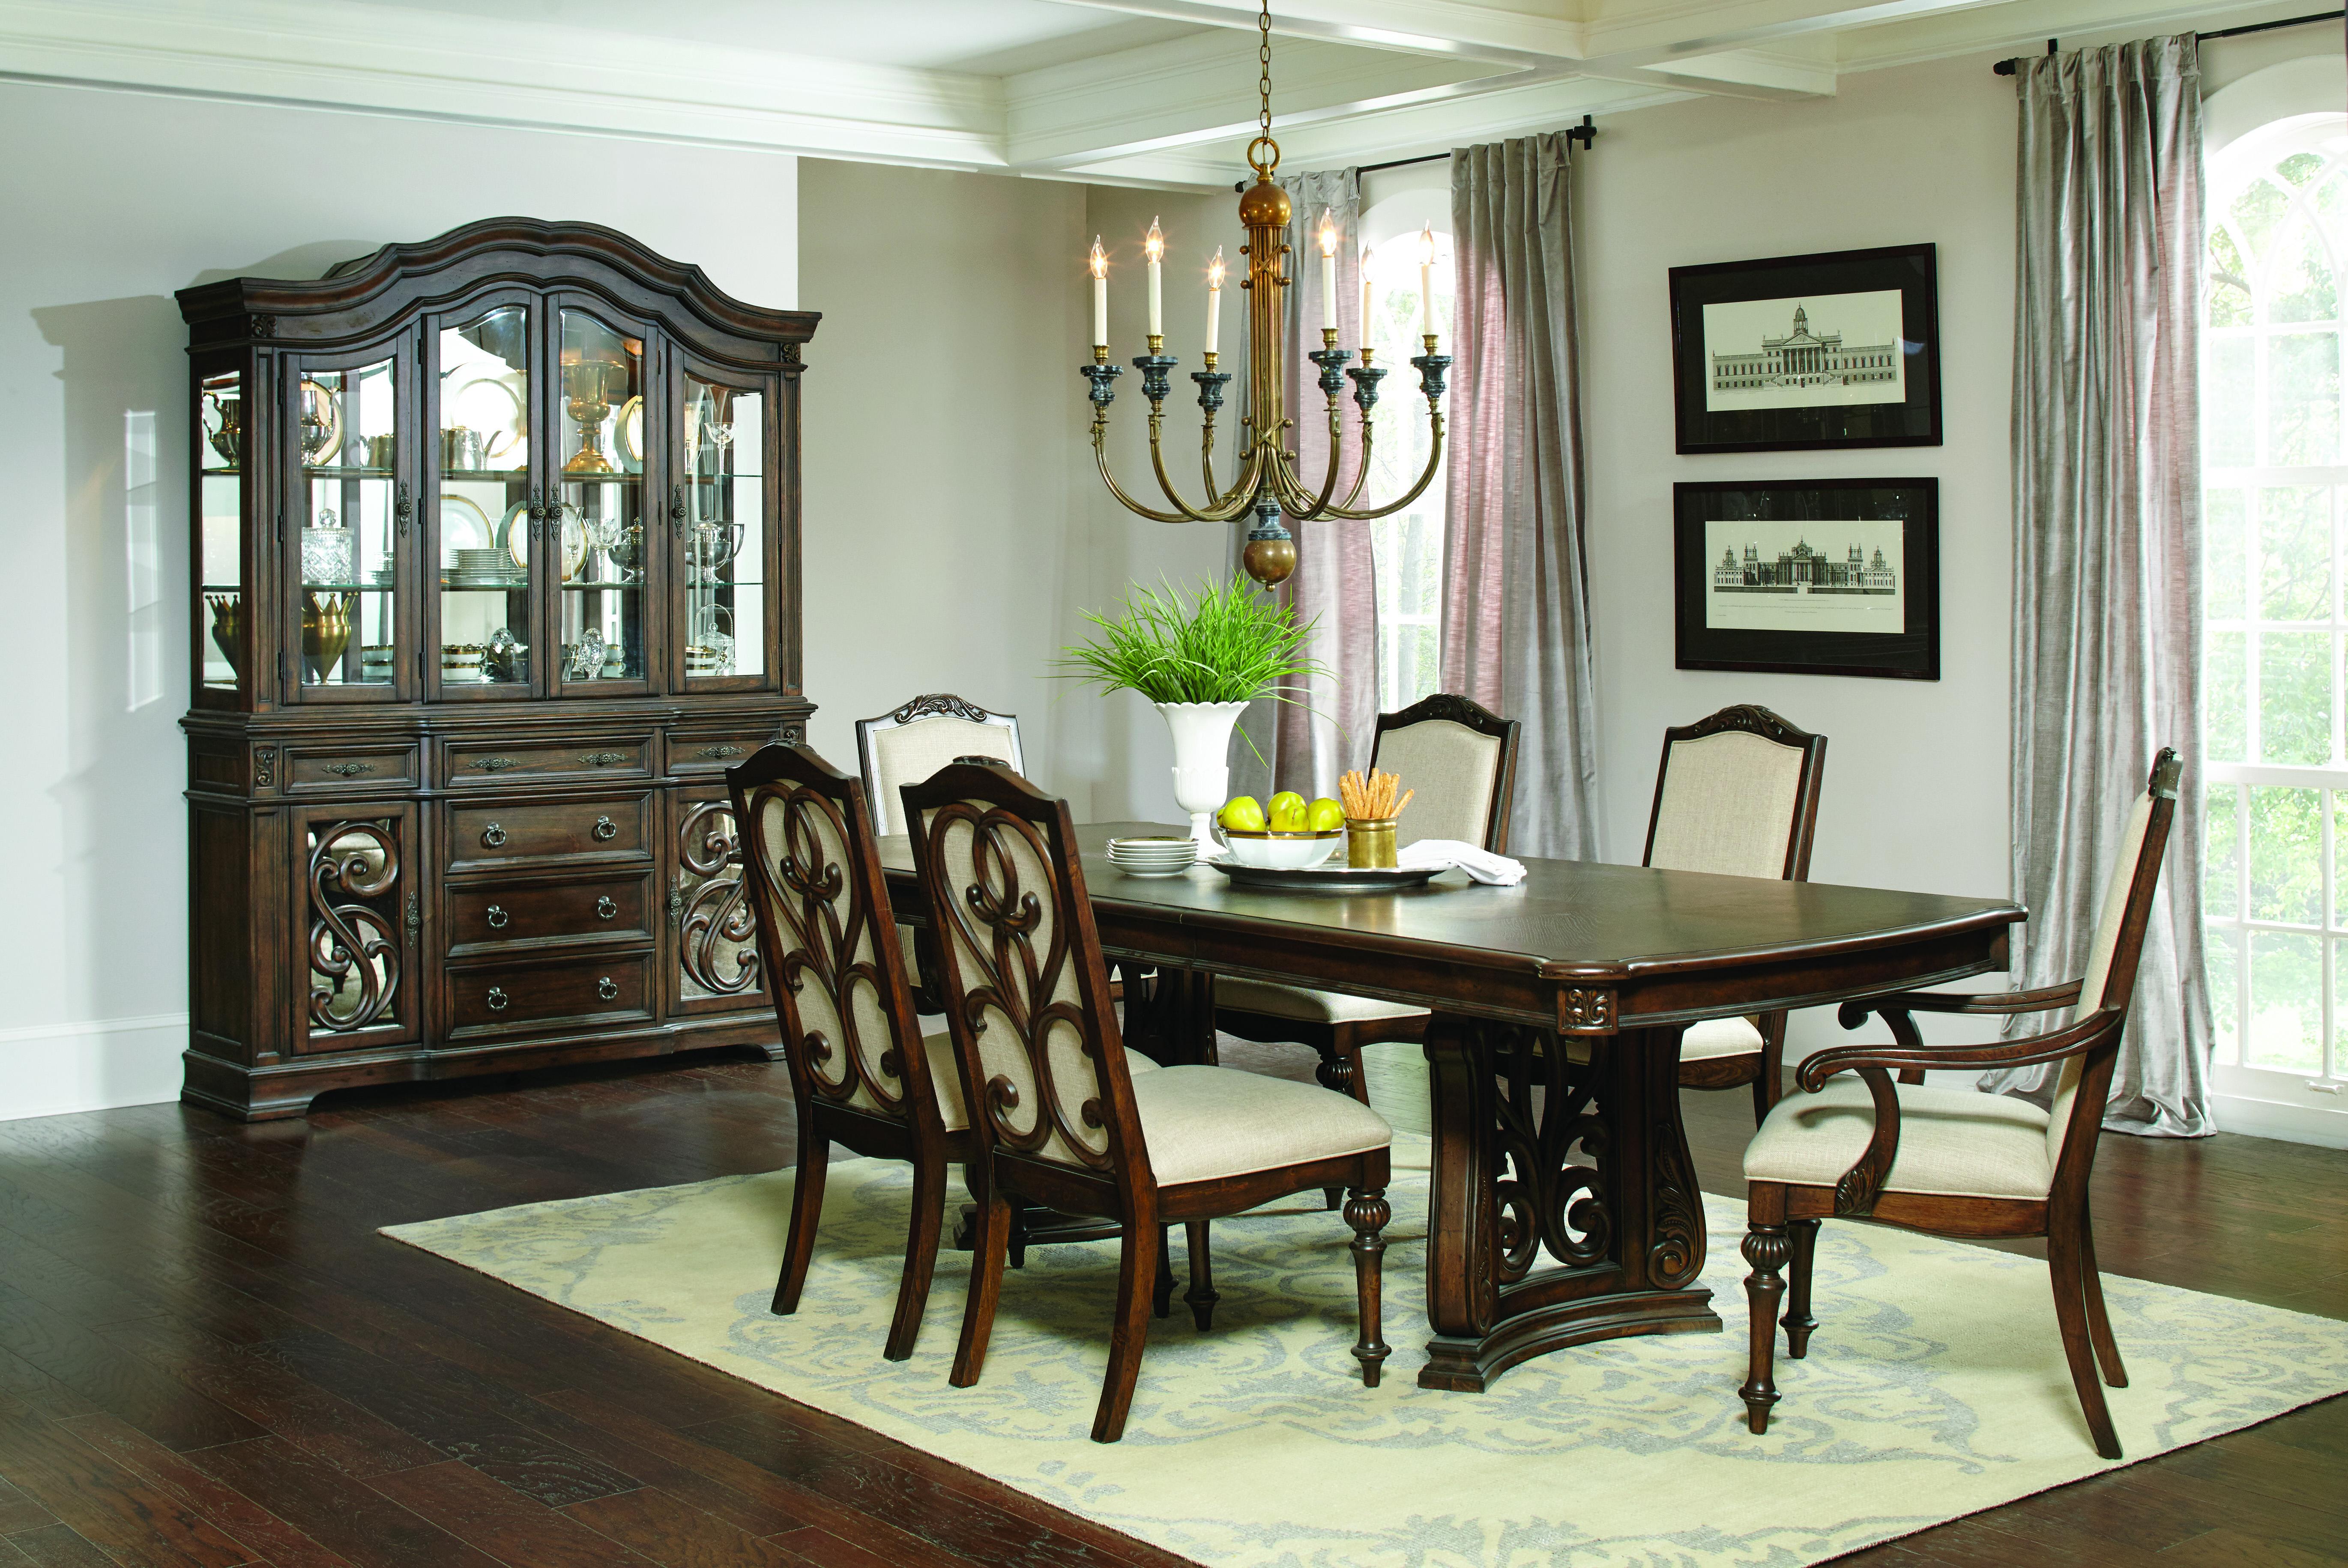 Etonnant Coaster® Ilana 5 Piece Dining Table Set 122251 S5